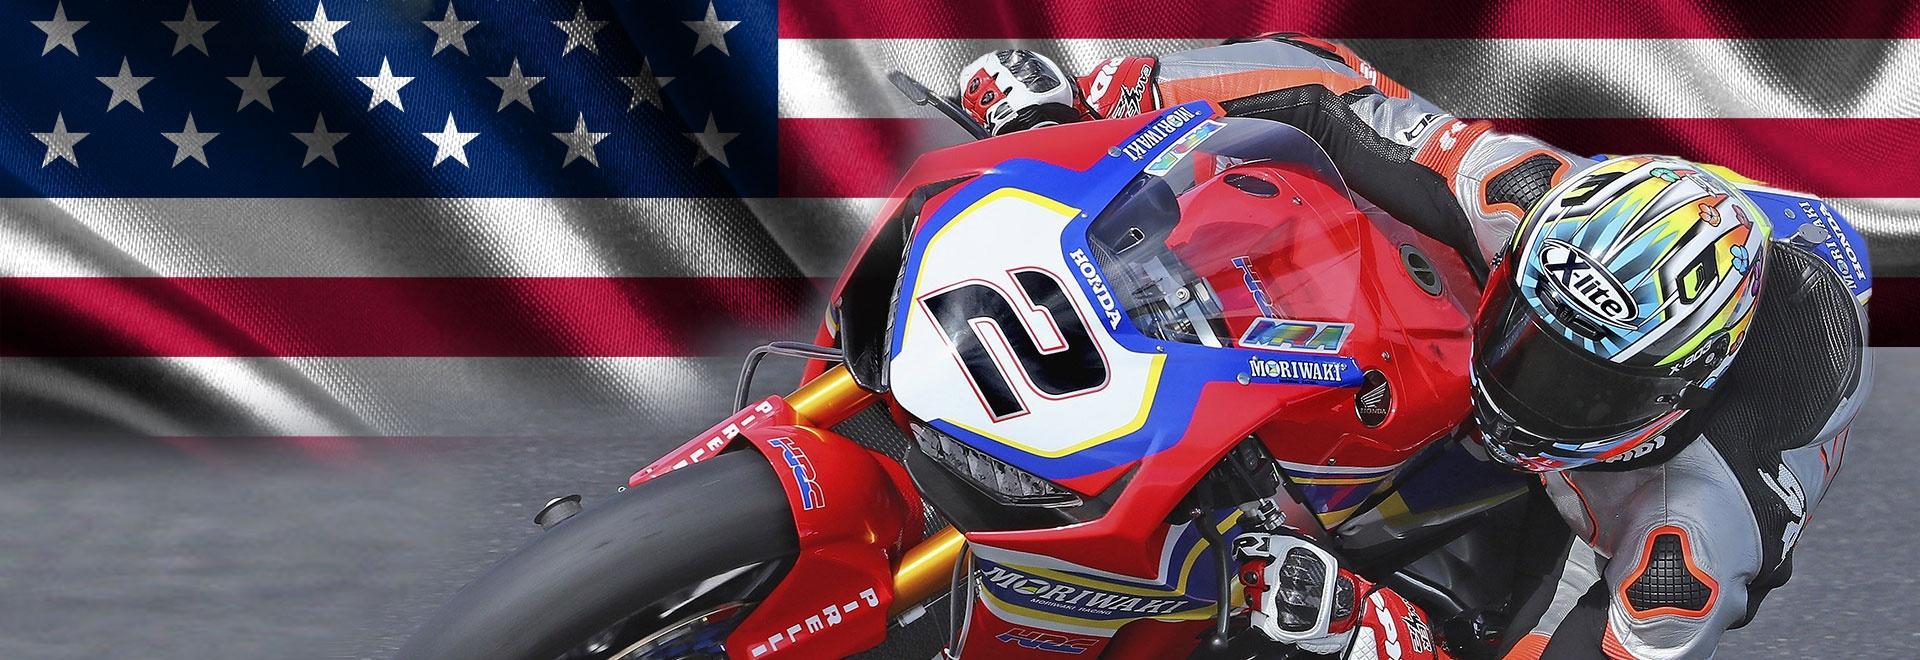 Stati Uniti. Race 2